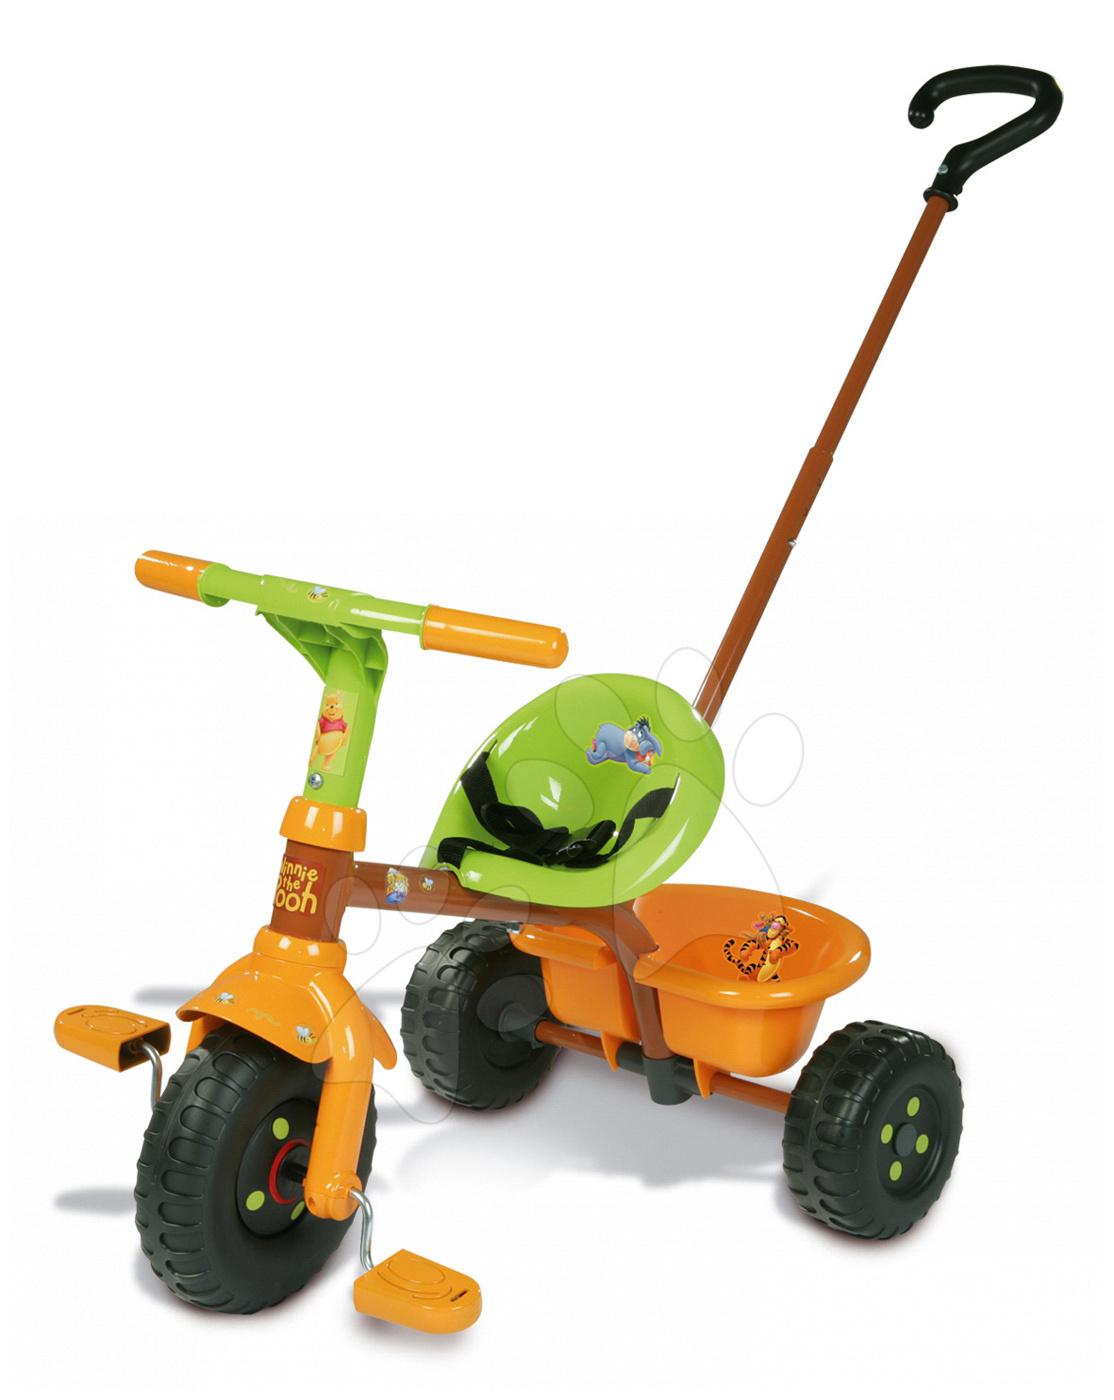 Triciklik 15 hónapos kortól - Tricikli Micimackó WD Smoby narancssárga-zöld 15 hó-tól